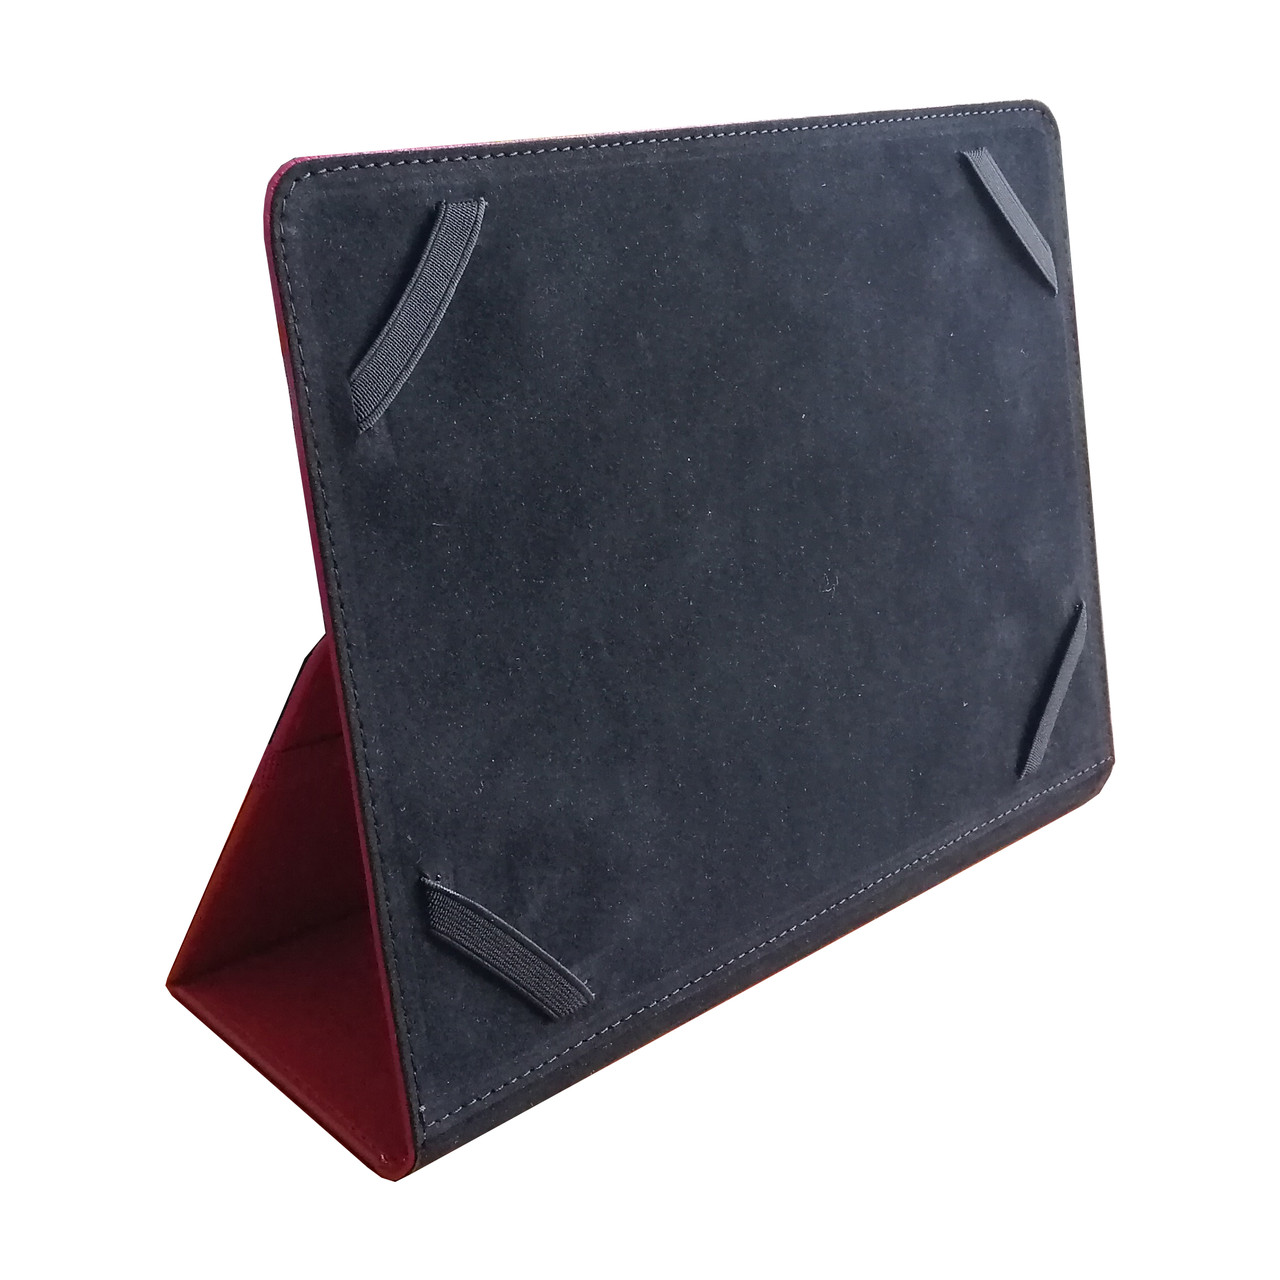 Чехол-книжка с подставкой для Lenovo Yoga Tablet 3-X50